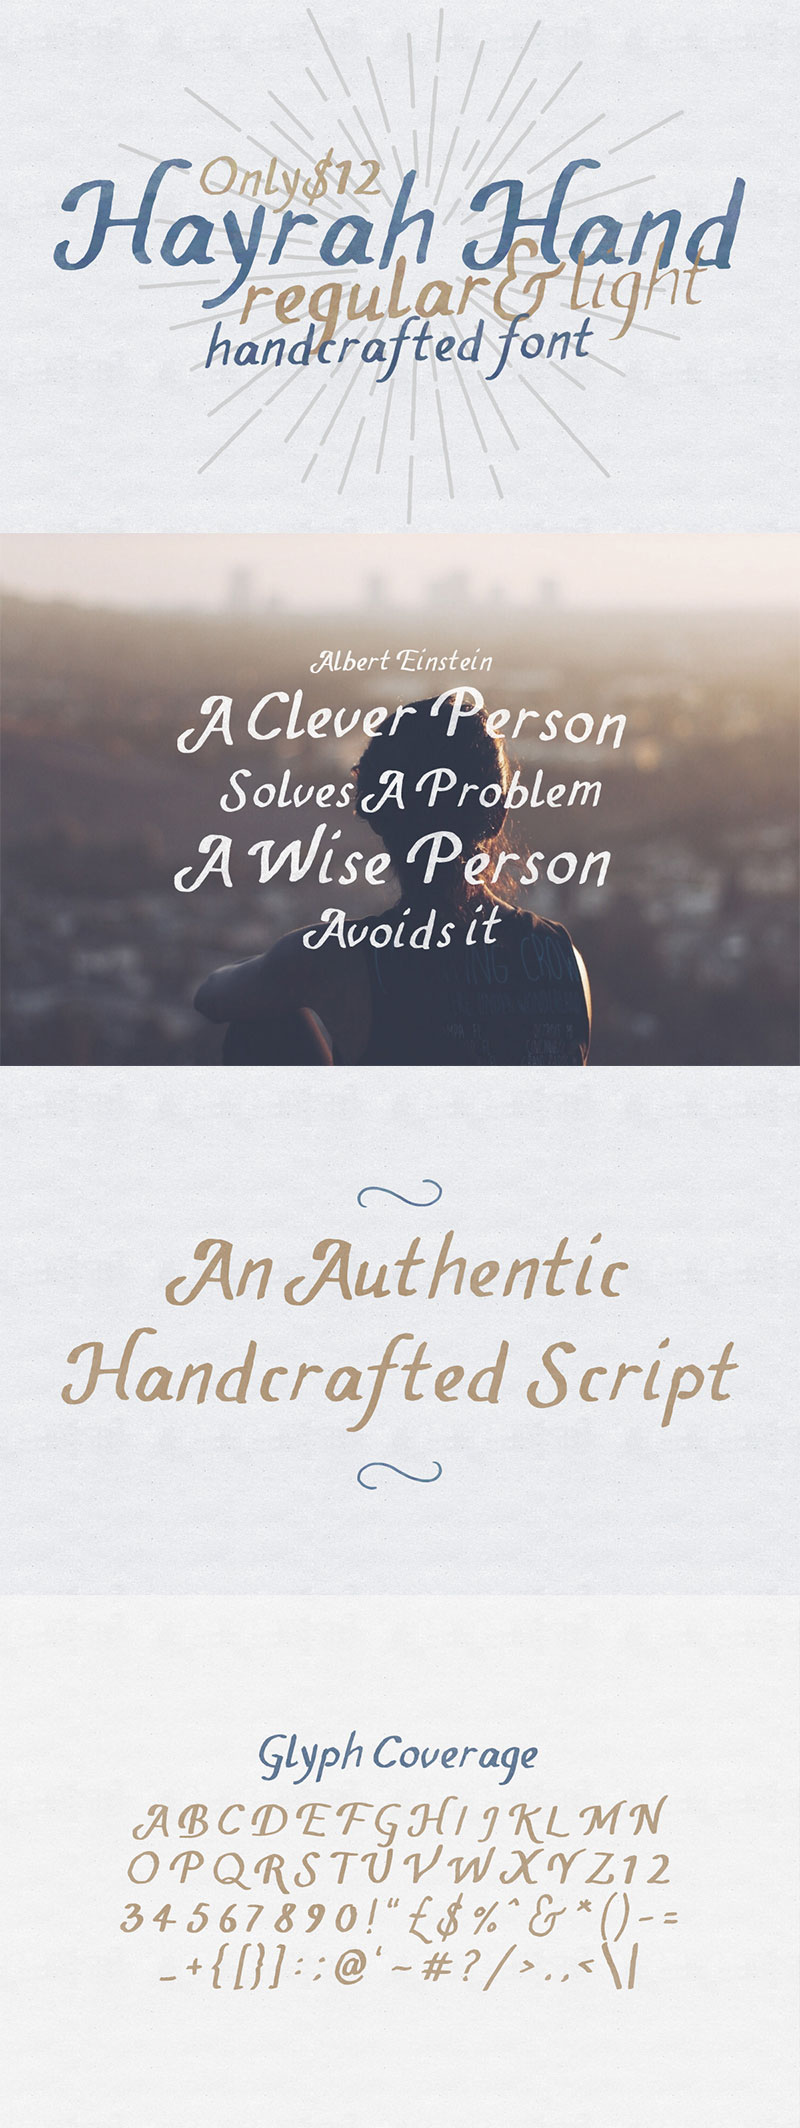 handwritten calligraphy font - hayrah-hand-01